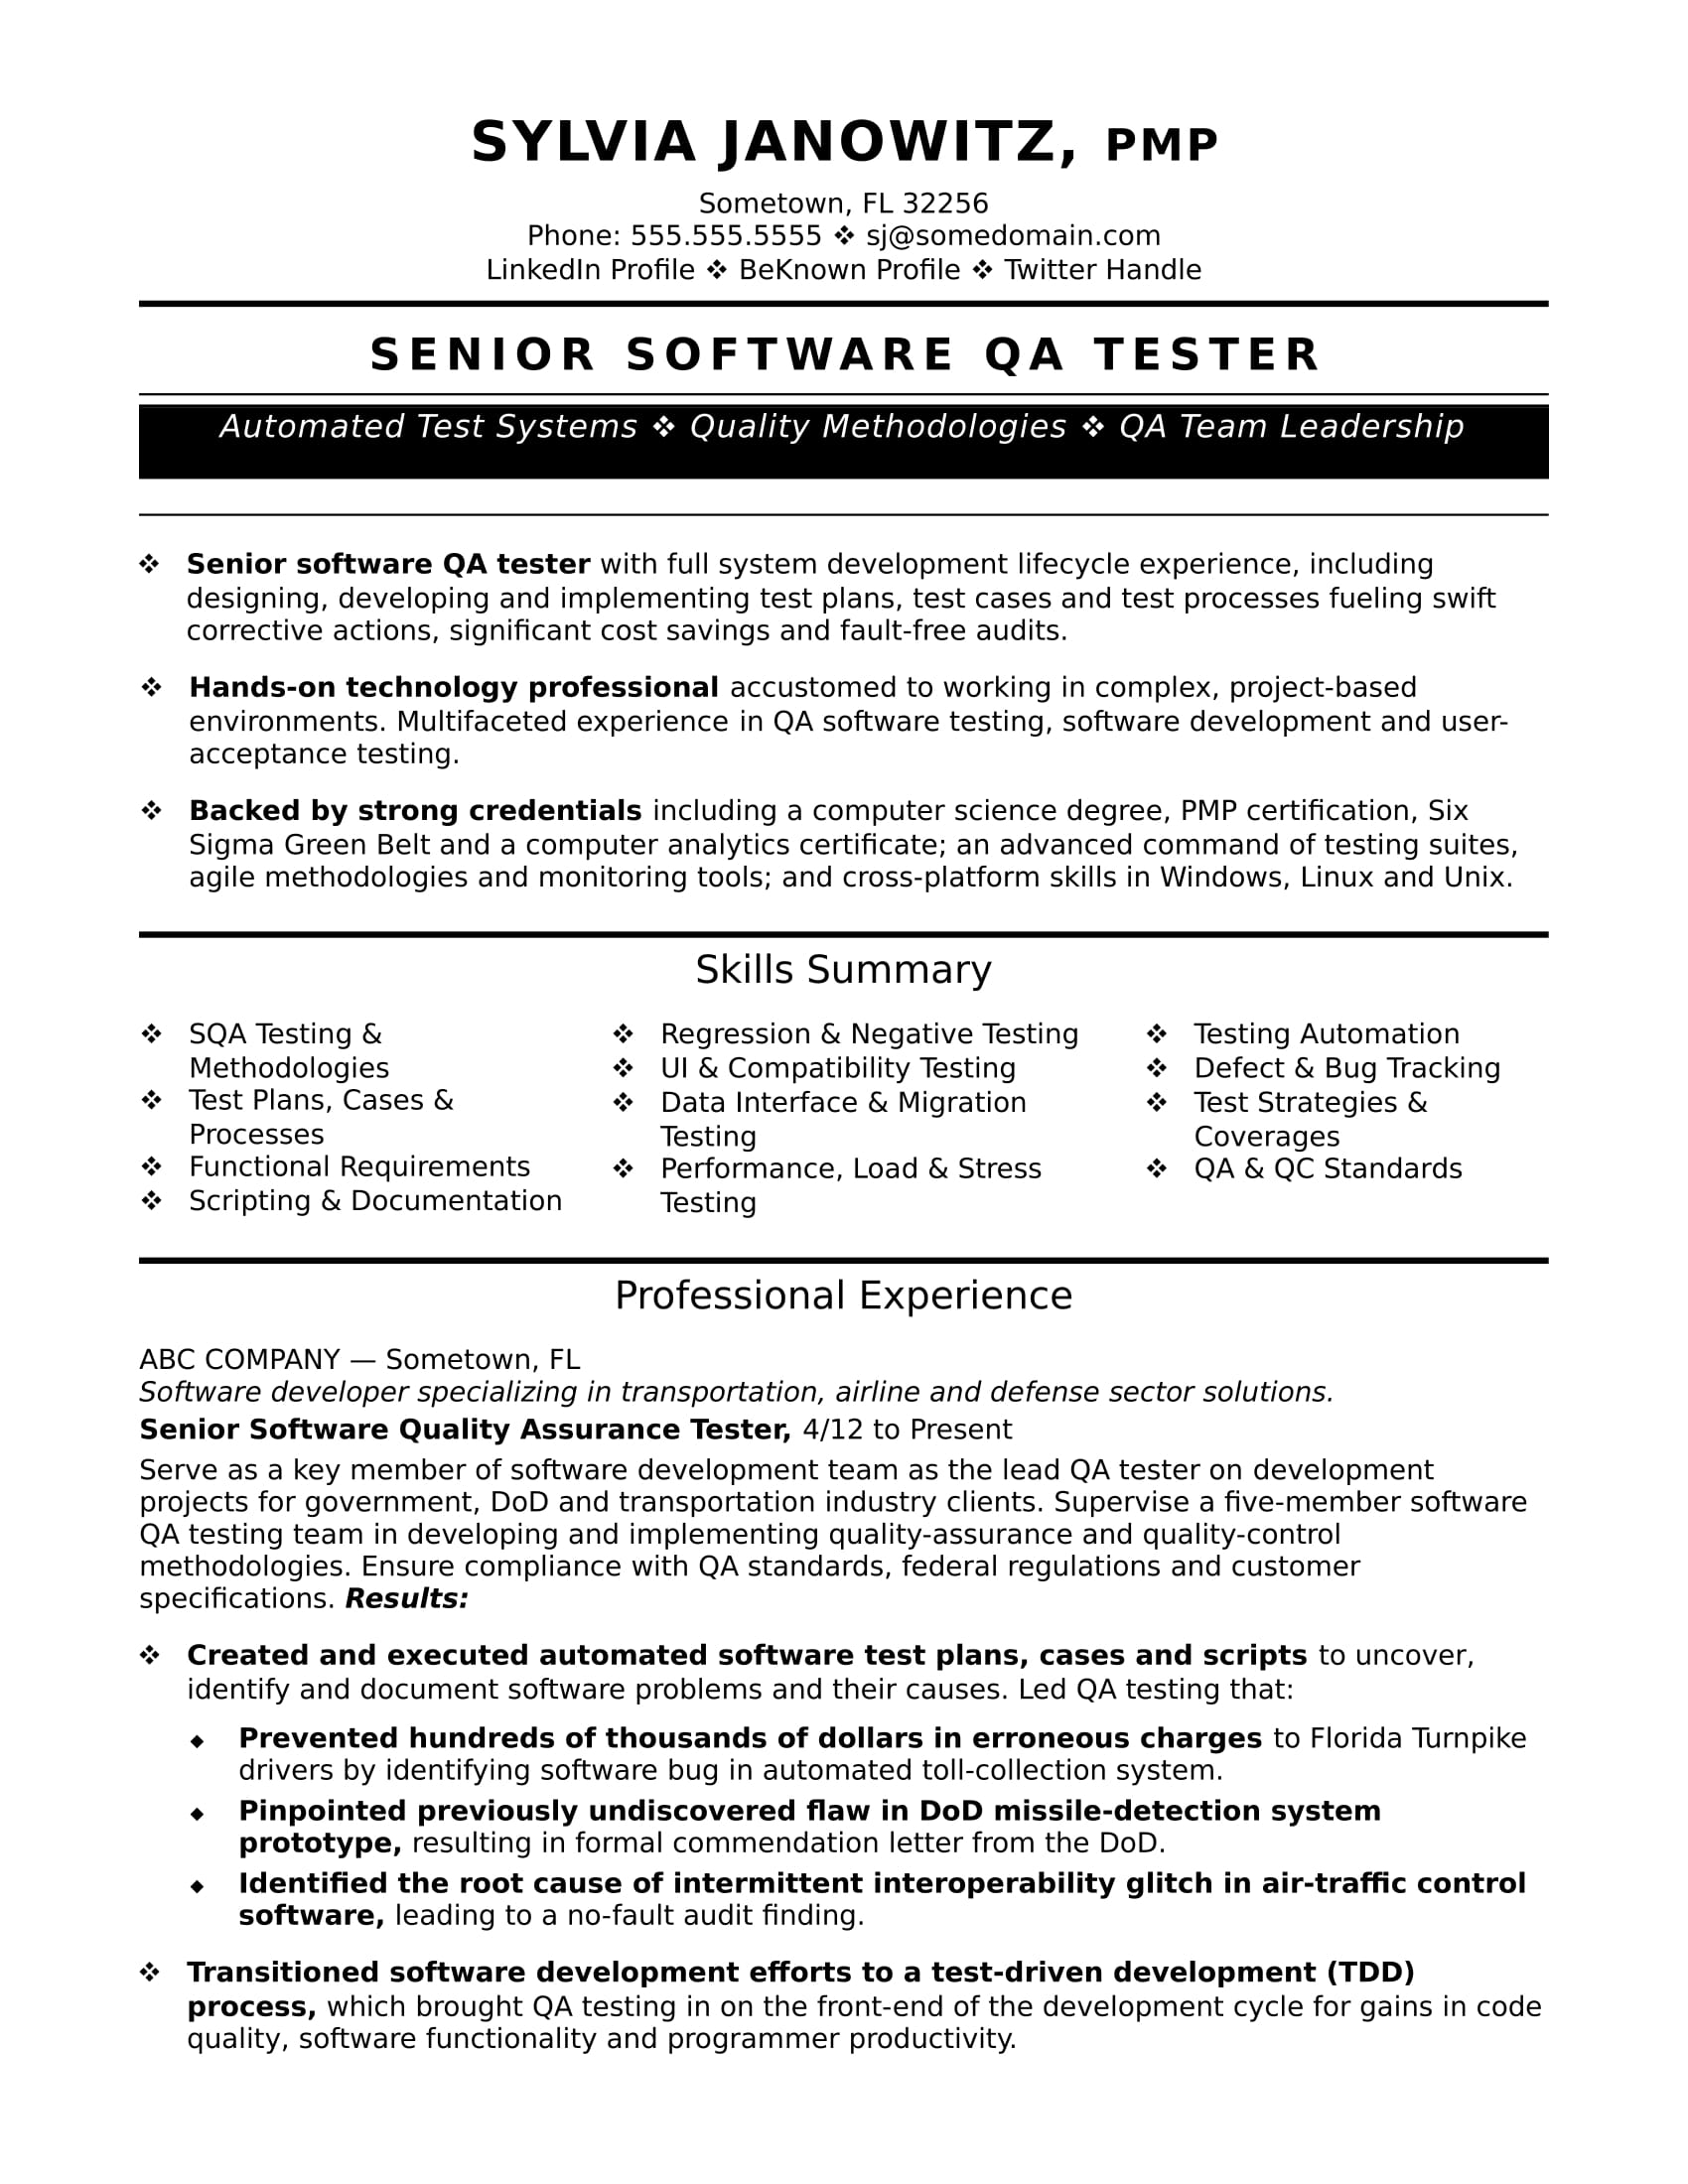 Data Security Manager Job Description